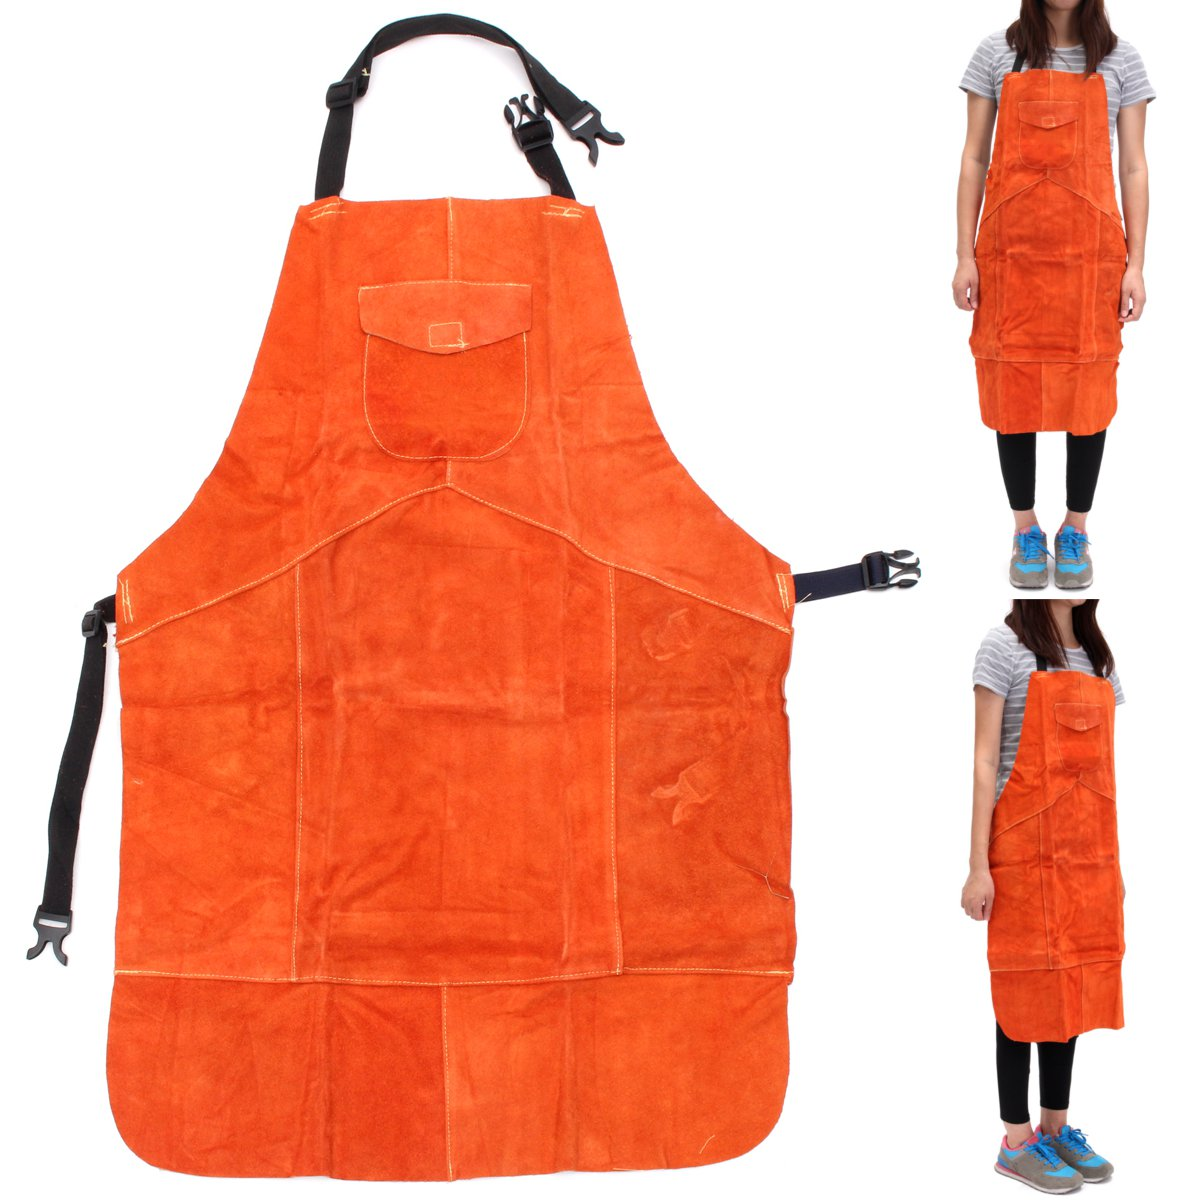 Cowhide Leather Welding Bib Shop Apron Heat Resistant Blacksmith Mechanic Smock